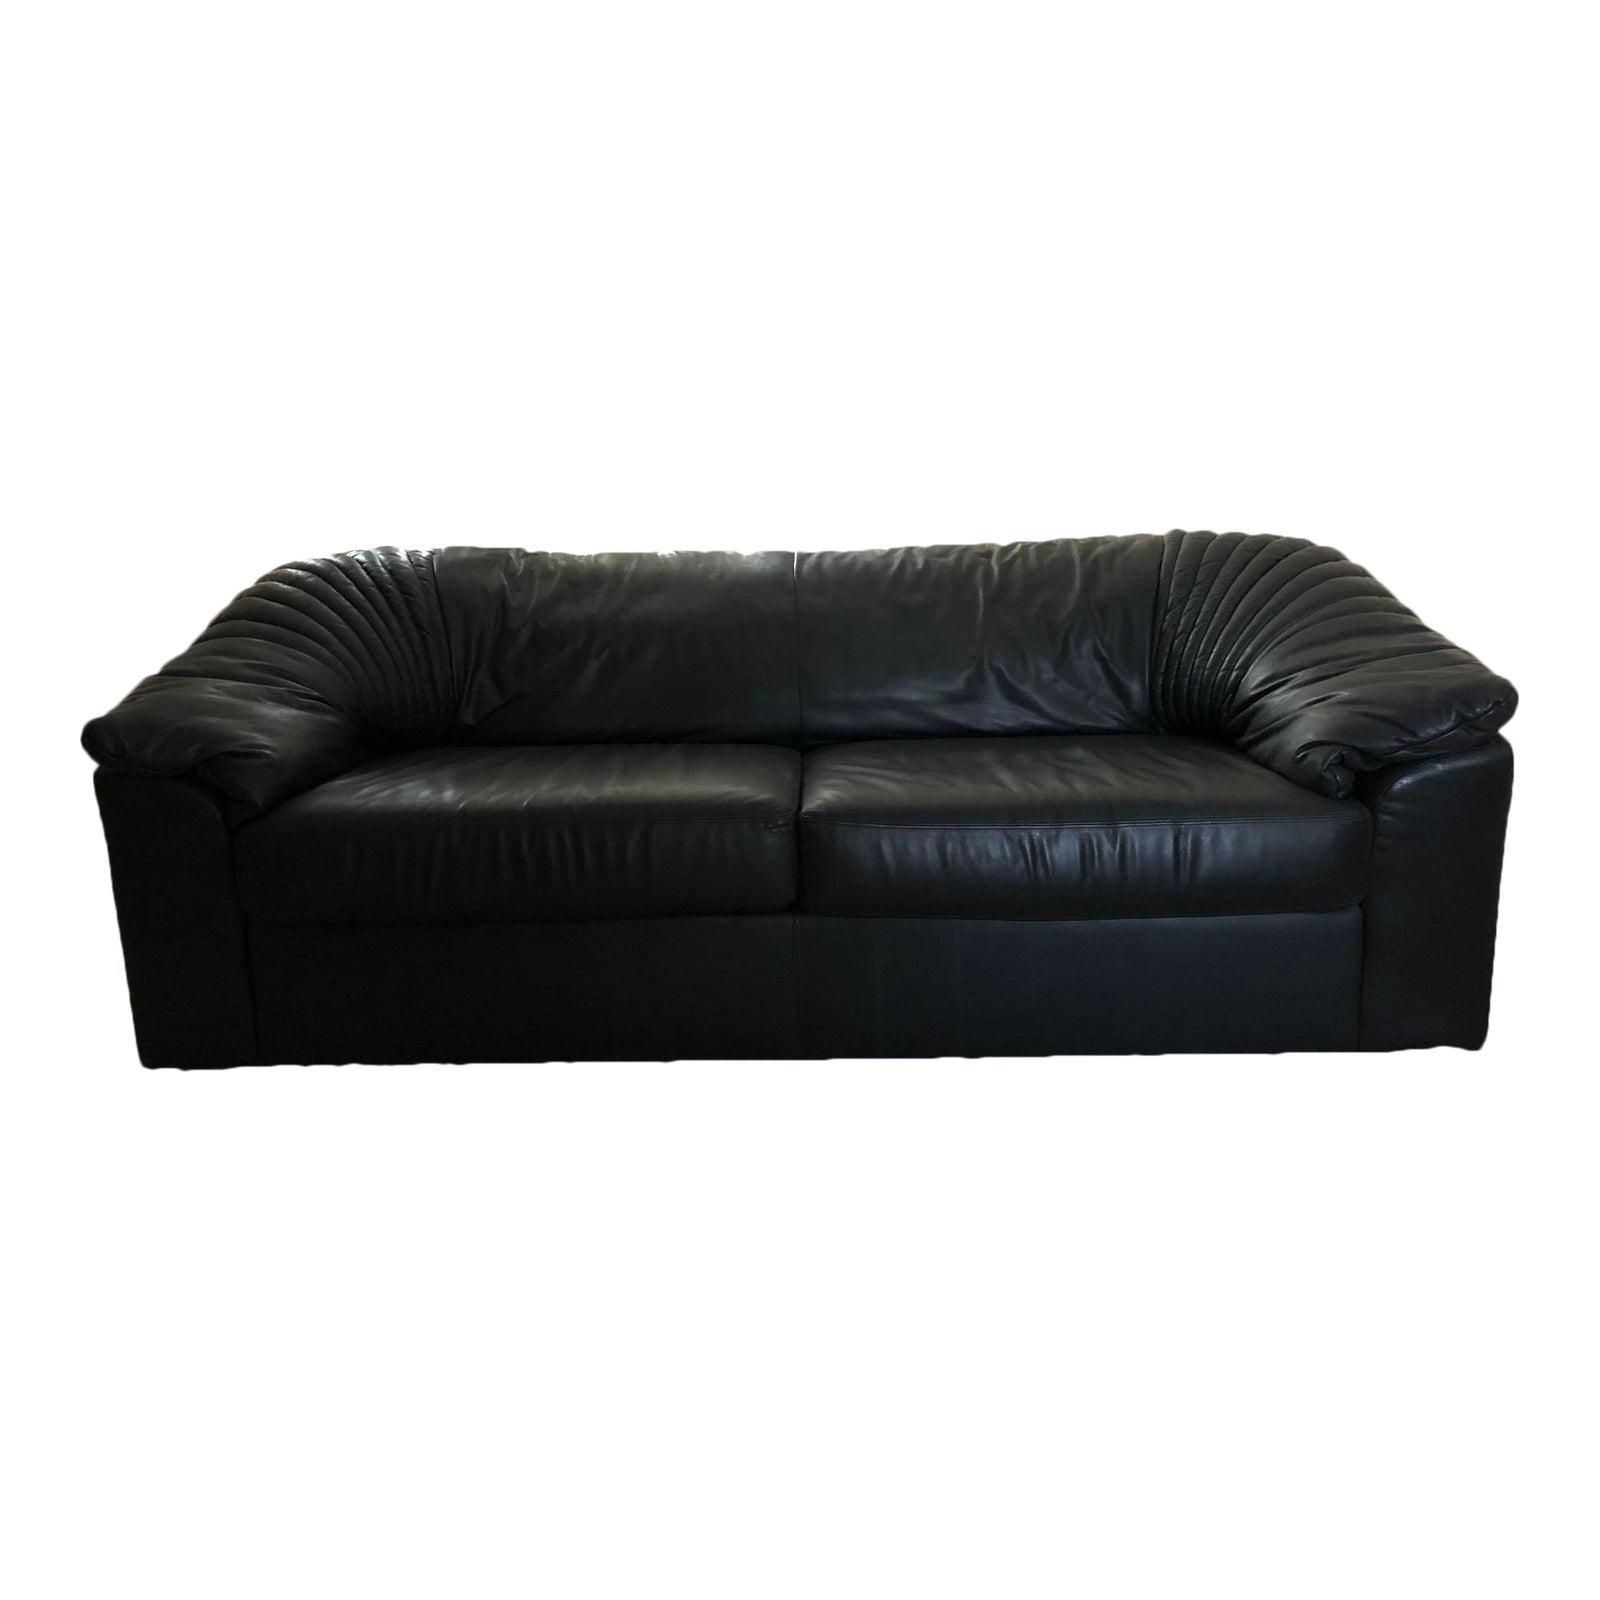 Transitional 1990s Vintage Roche Bobois Black Leather Sofa Chairish